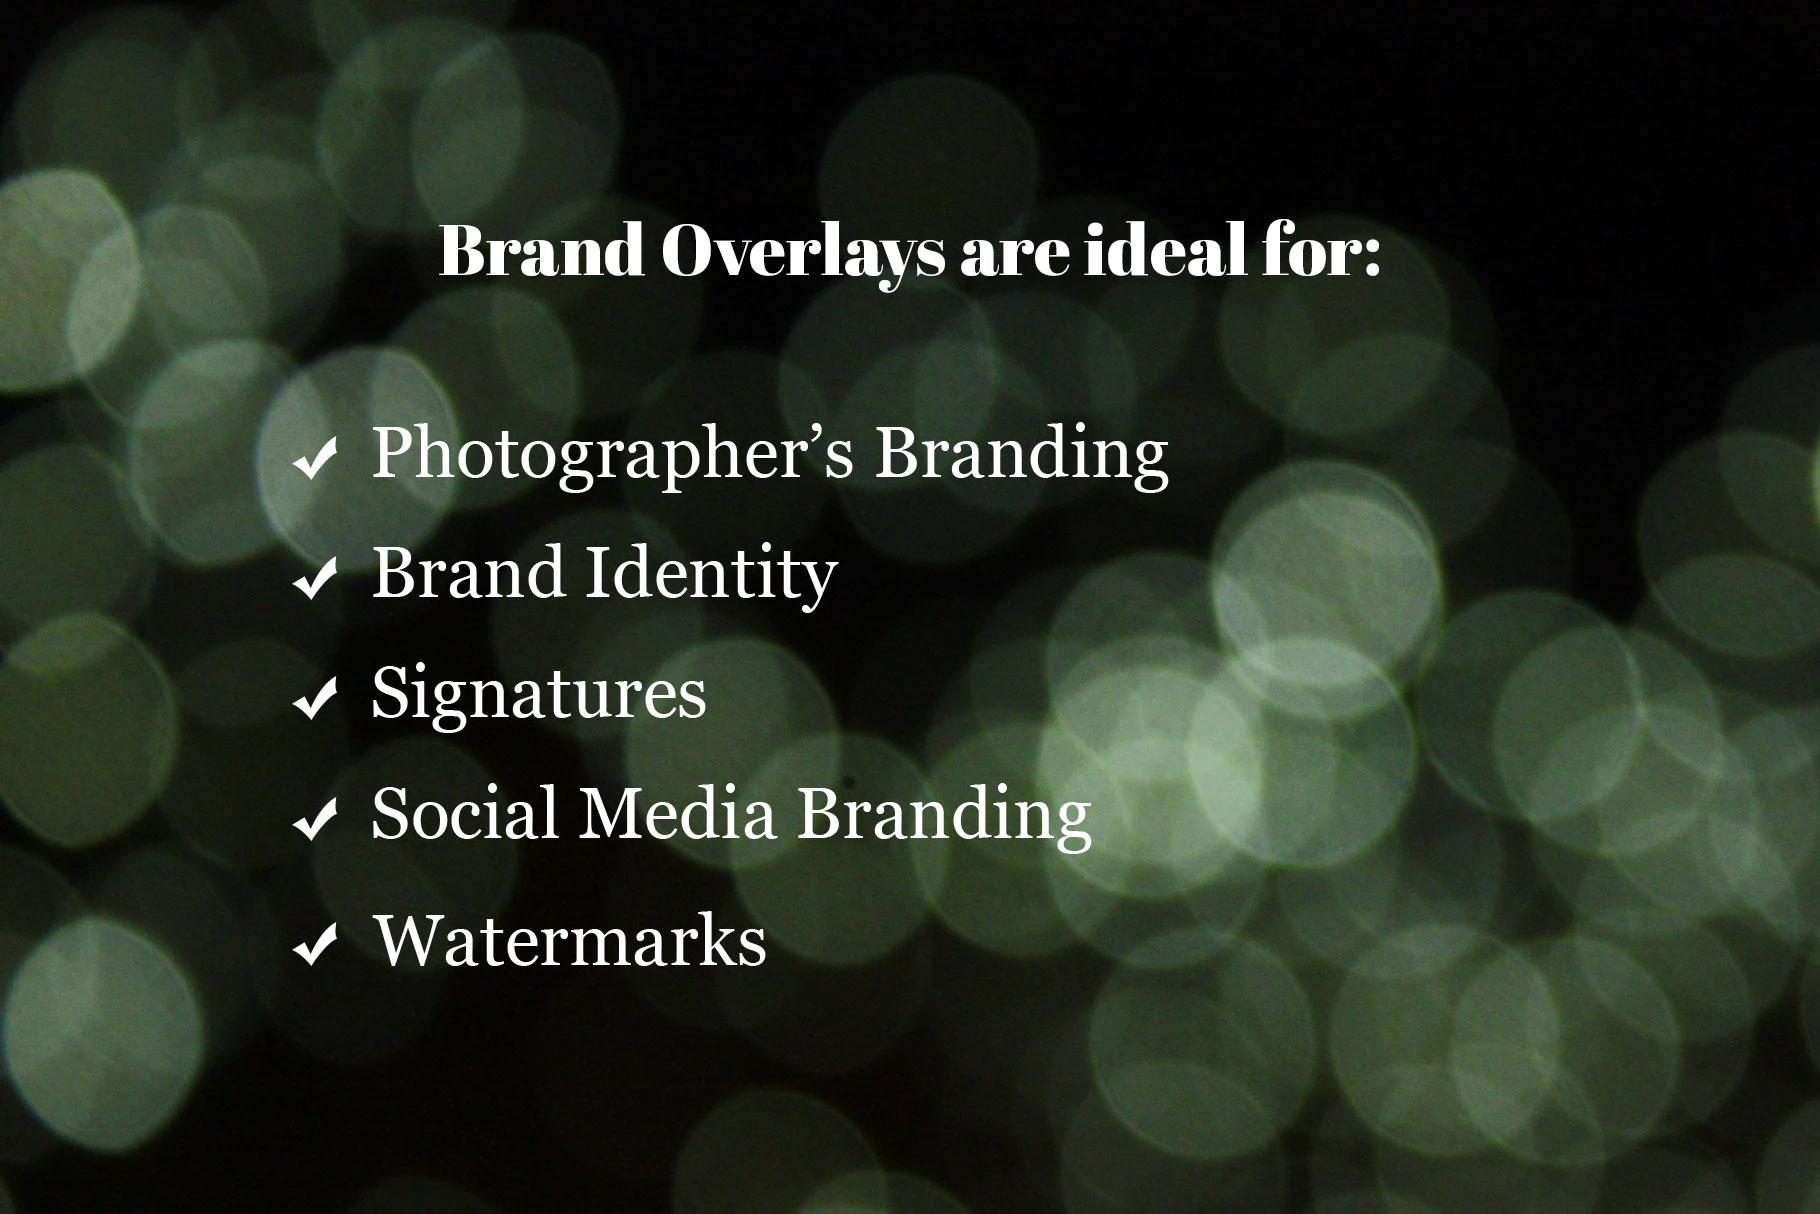 Brand Overlays